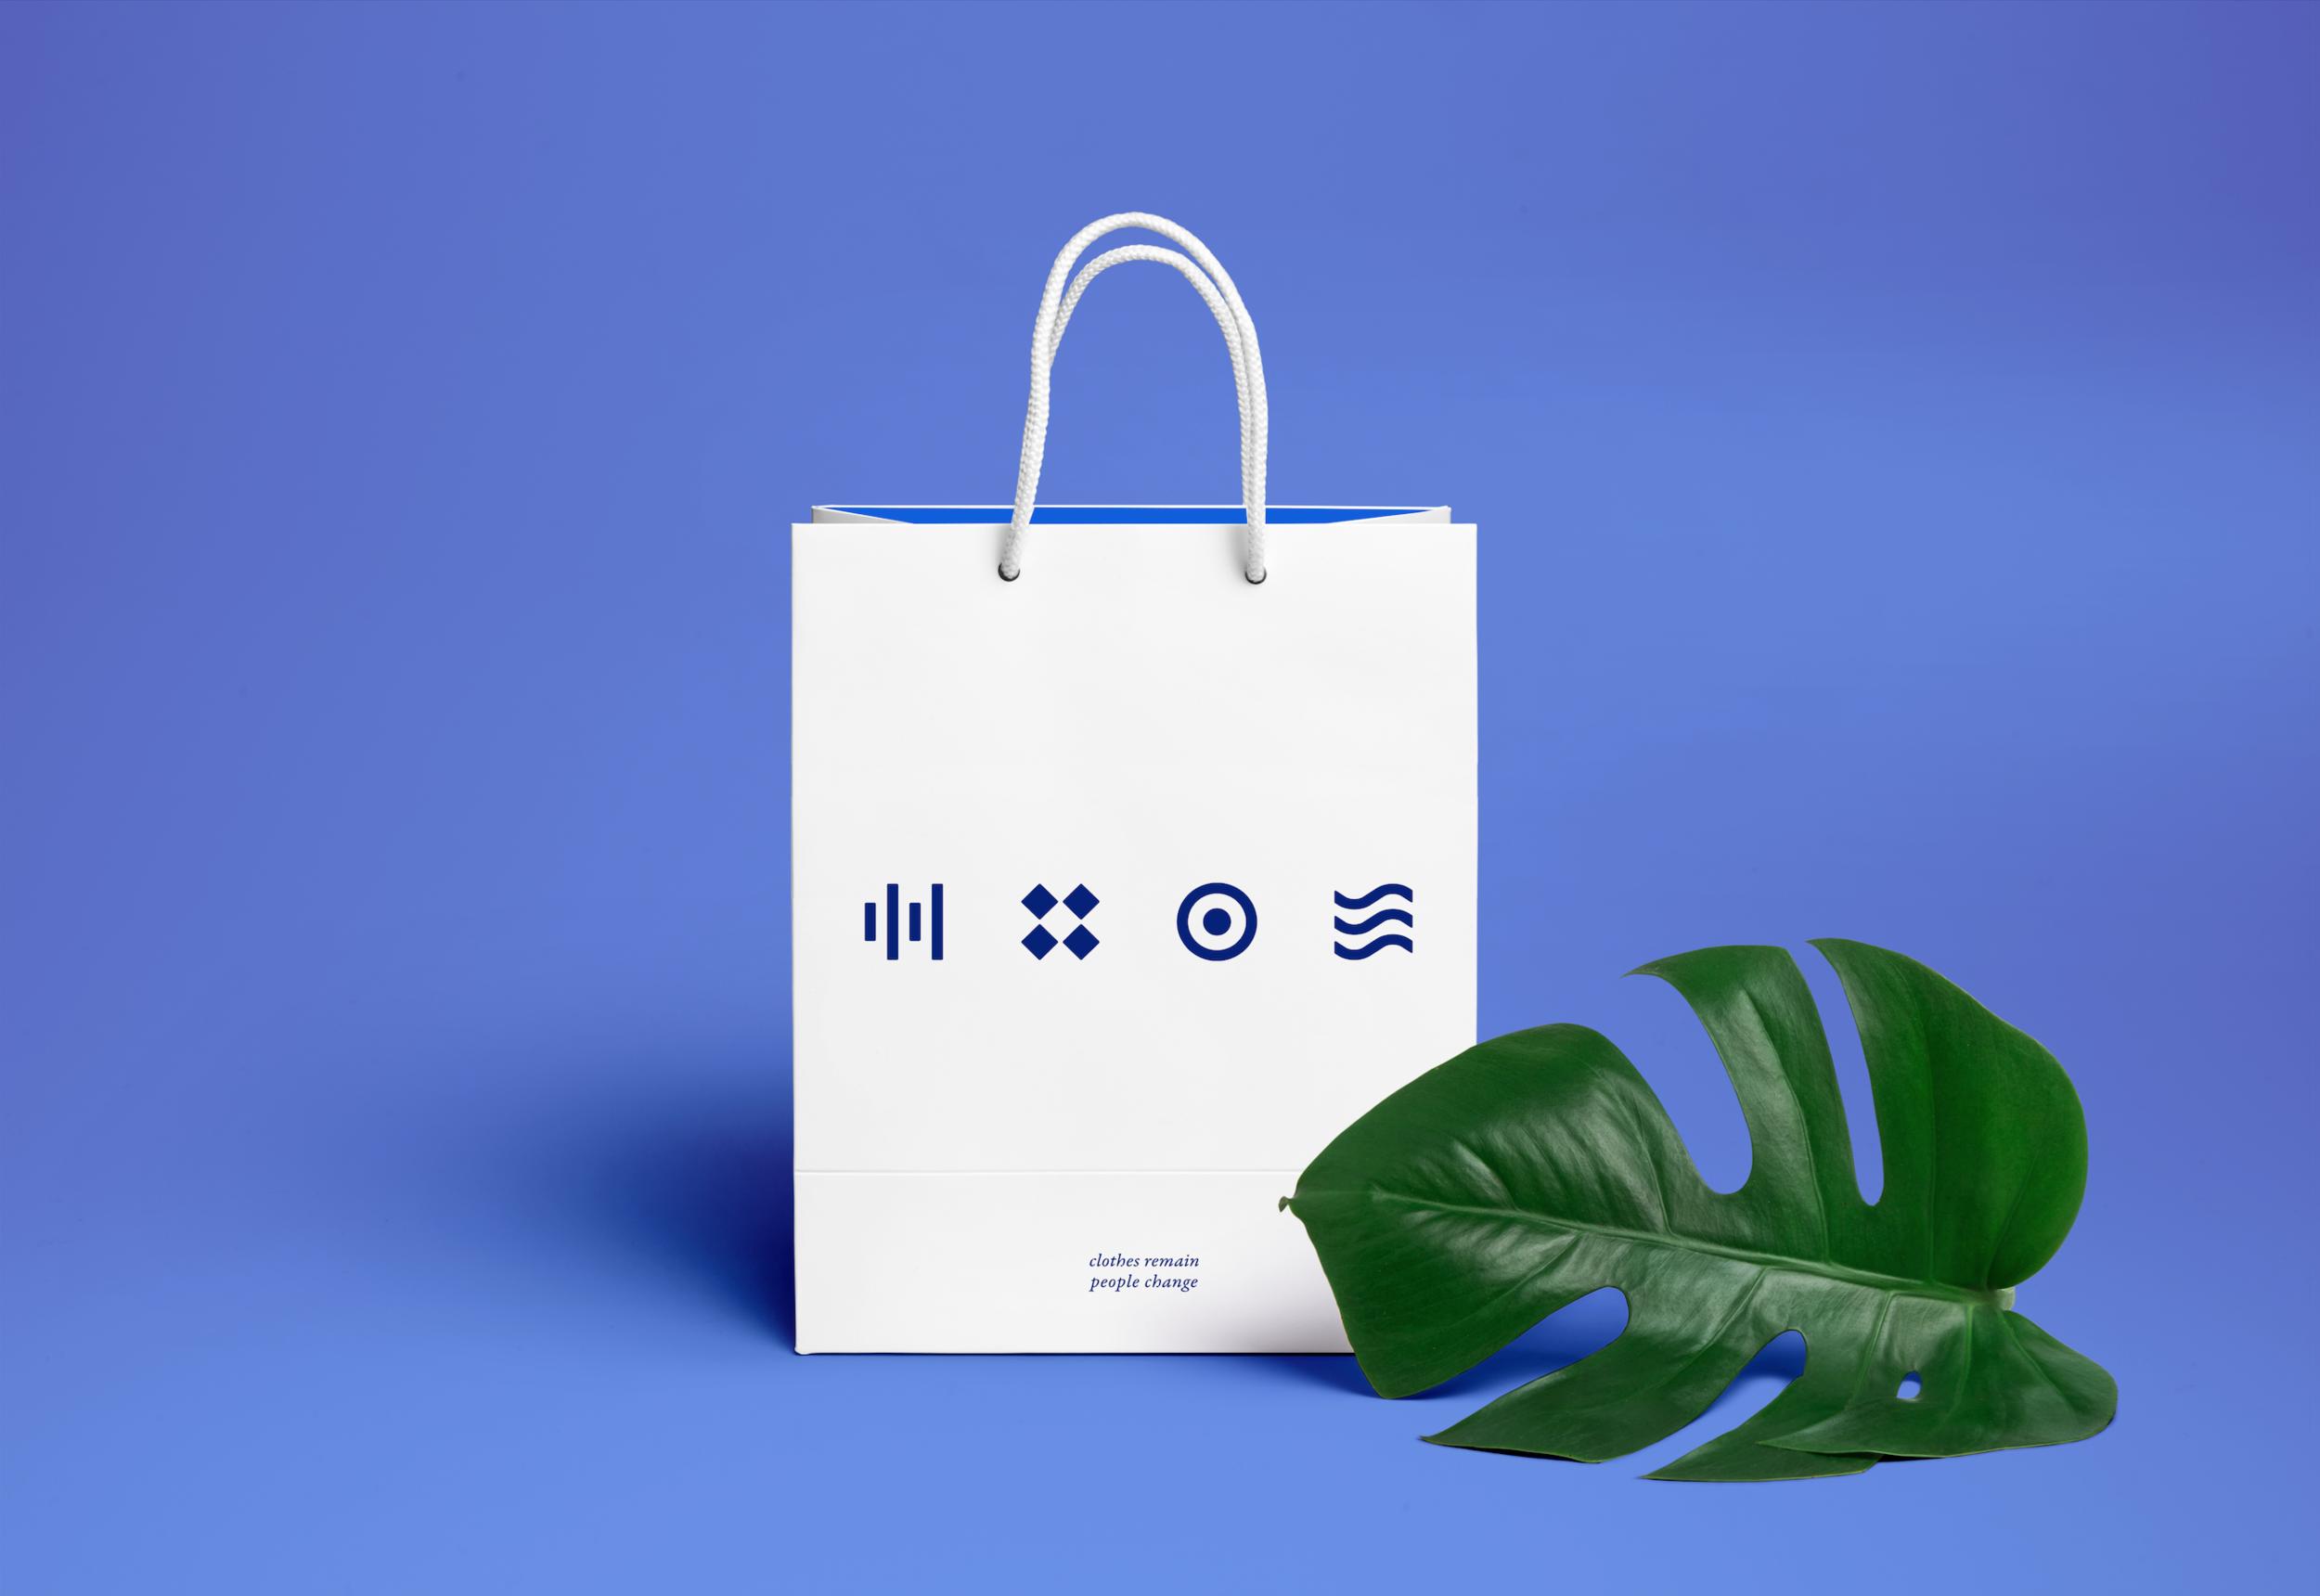 vlevle-pool-paper-bag-design-gaelle_de_laveleye